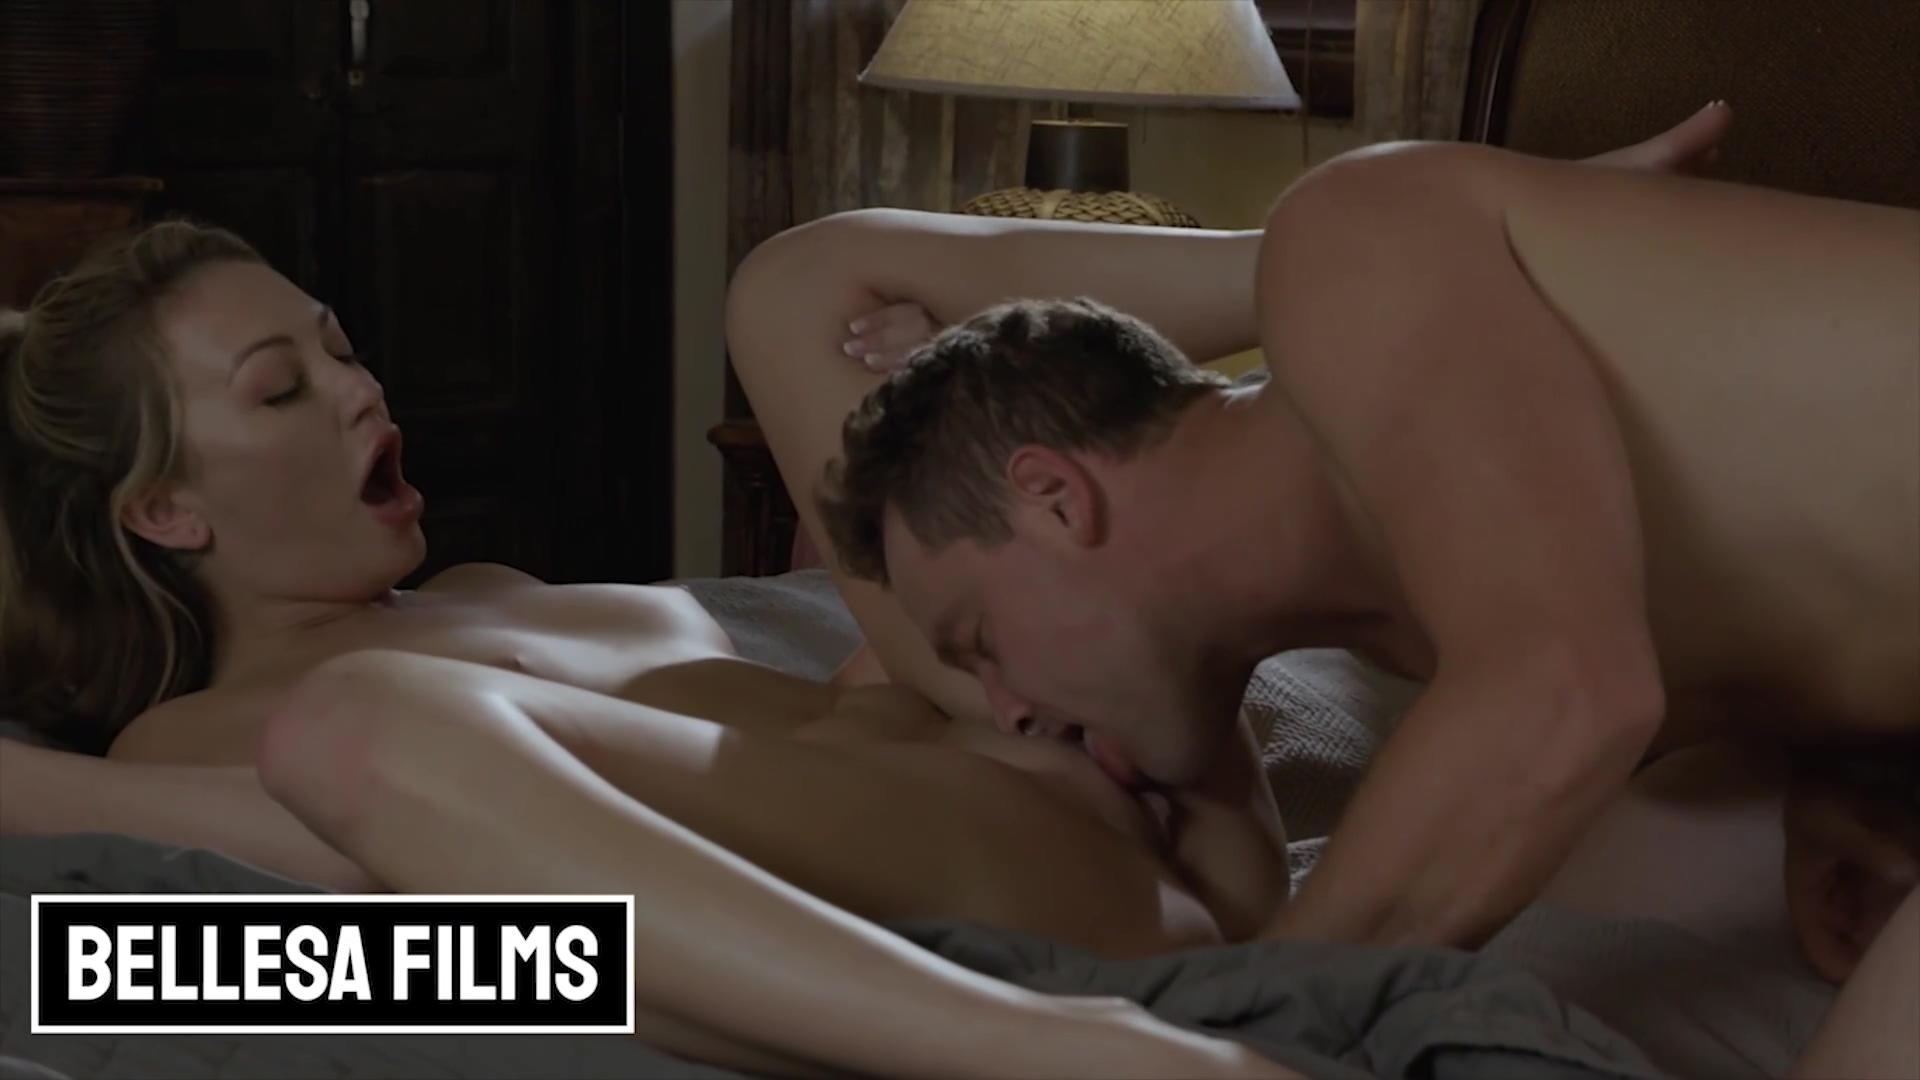 Video 1562314404: van wylde, blonde deep throats cock, deep throat big cock, handjob deep throating, deep throat hd, hot sex